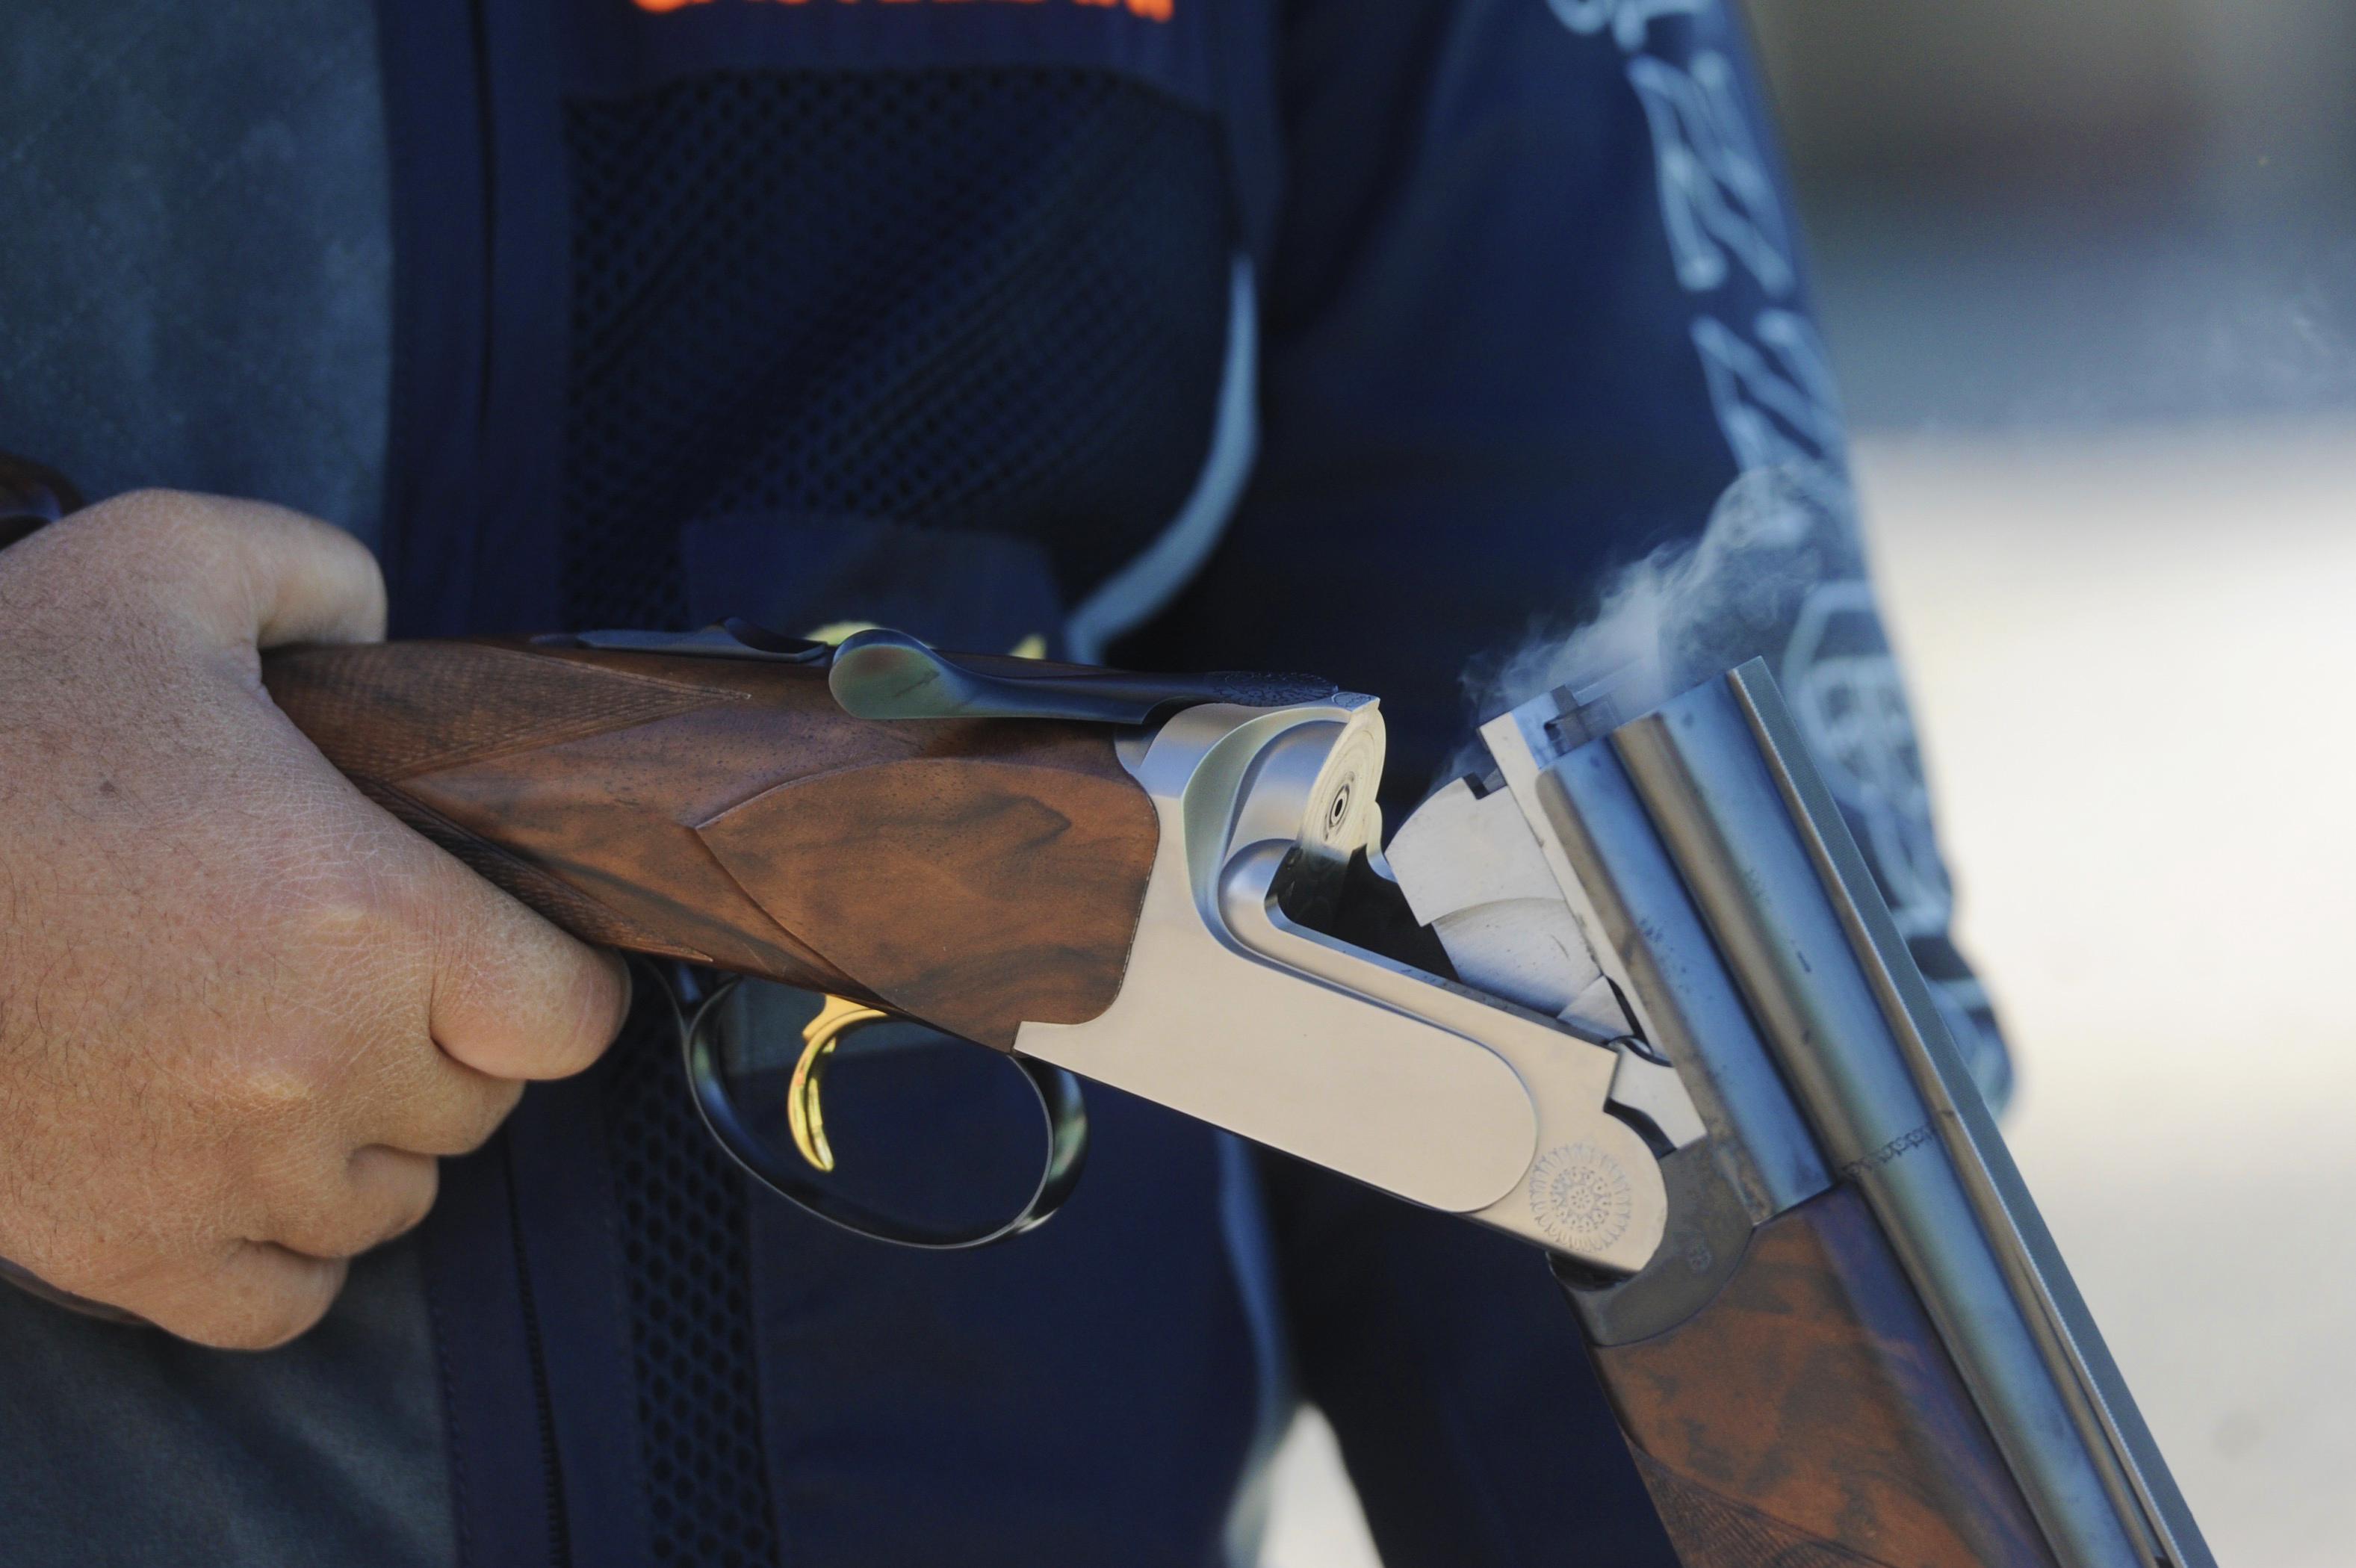 A Shooter In Sheikh Fahad Al Salem Sabah Shooting Tournament Reloading His Gun